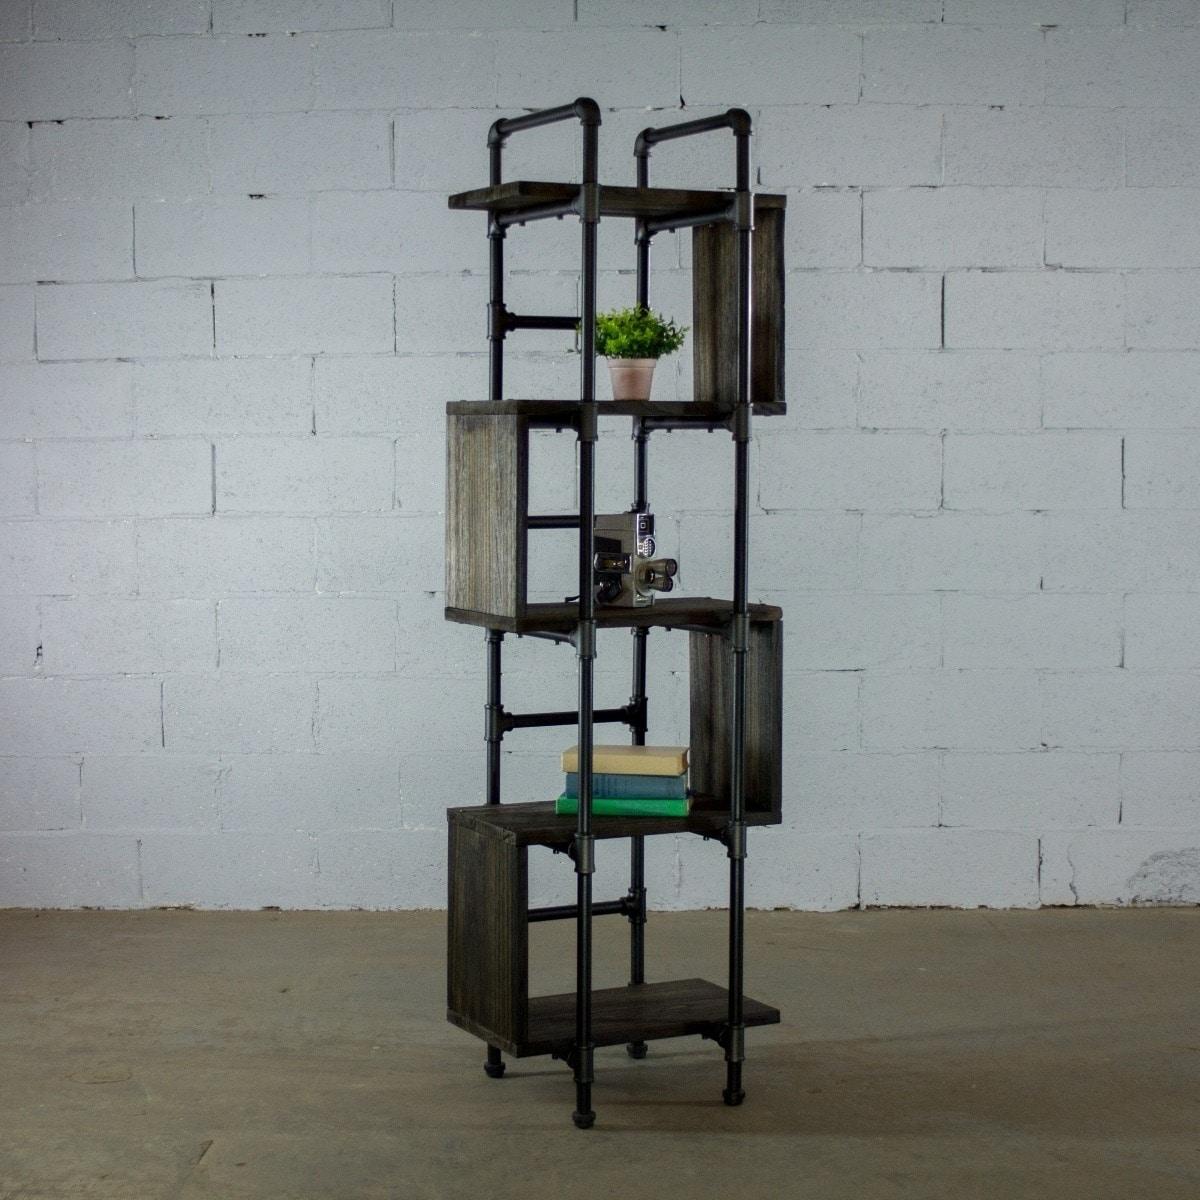 Furniture pipeline tucson modern tall narrow 5 shelf industrial etagere bookcase display